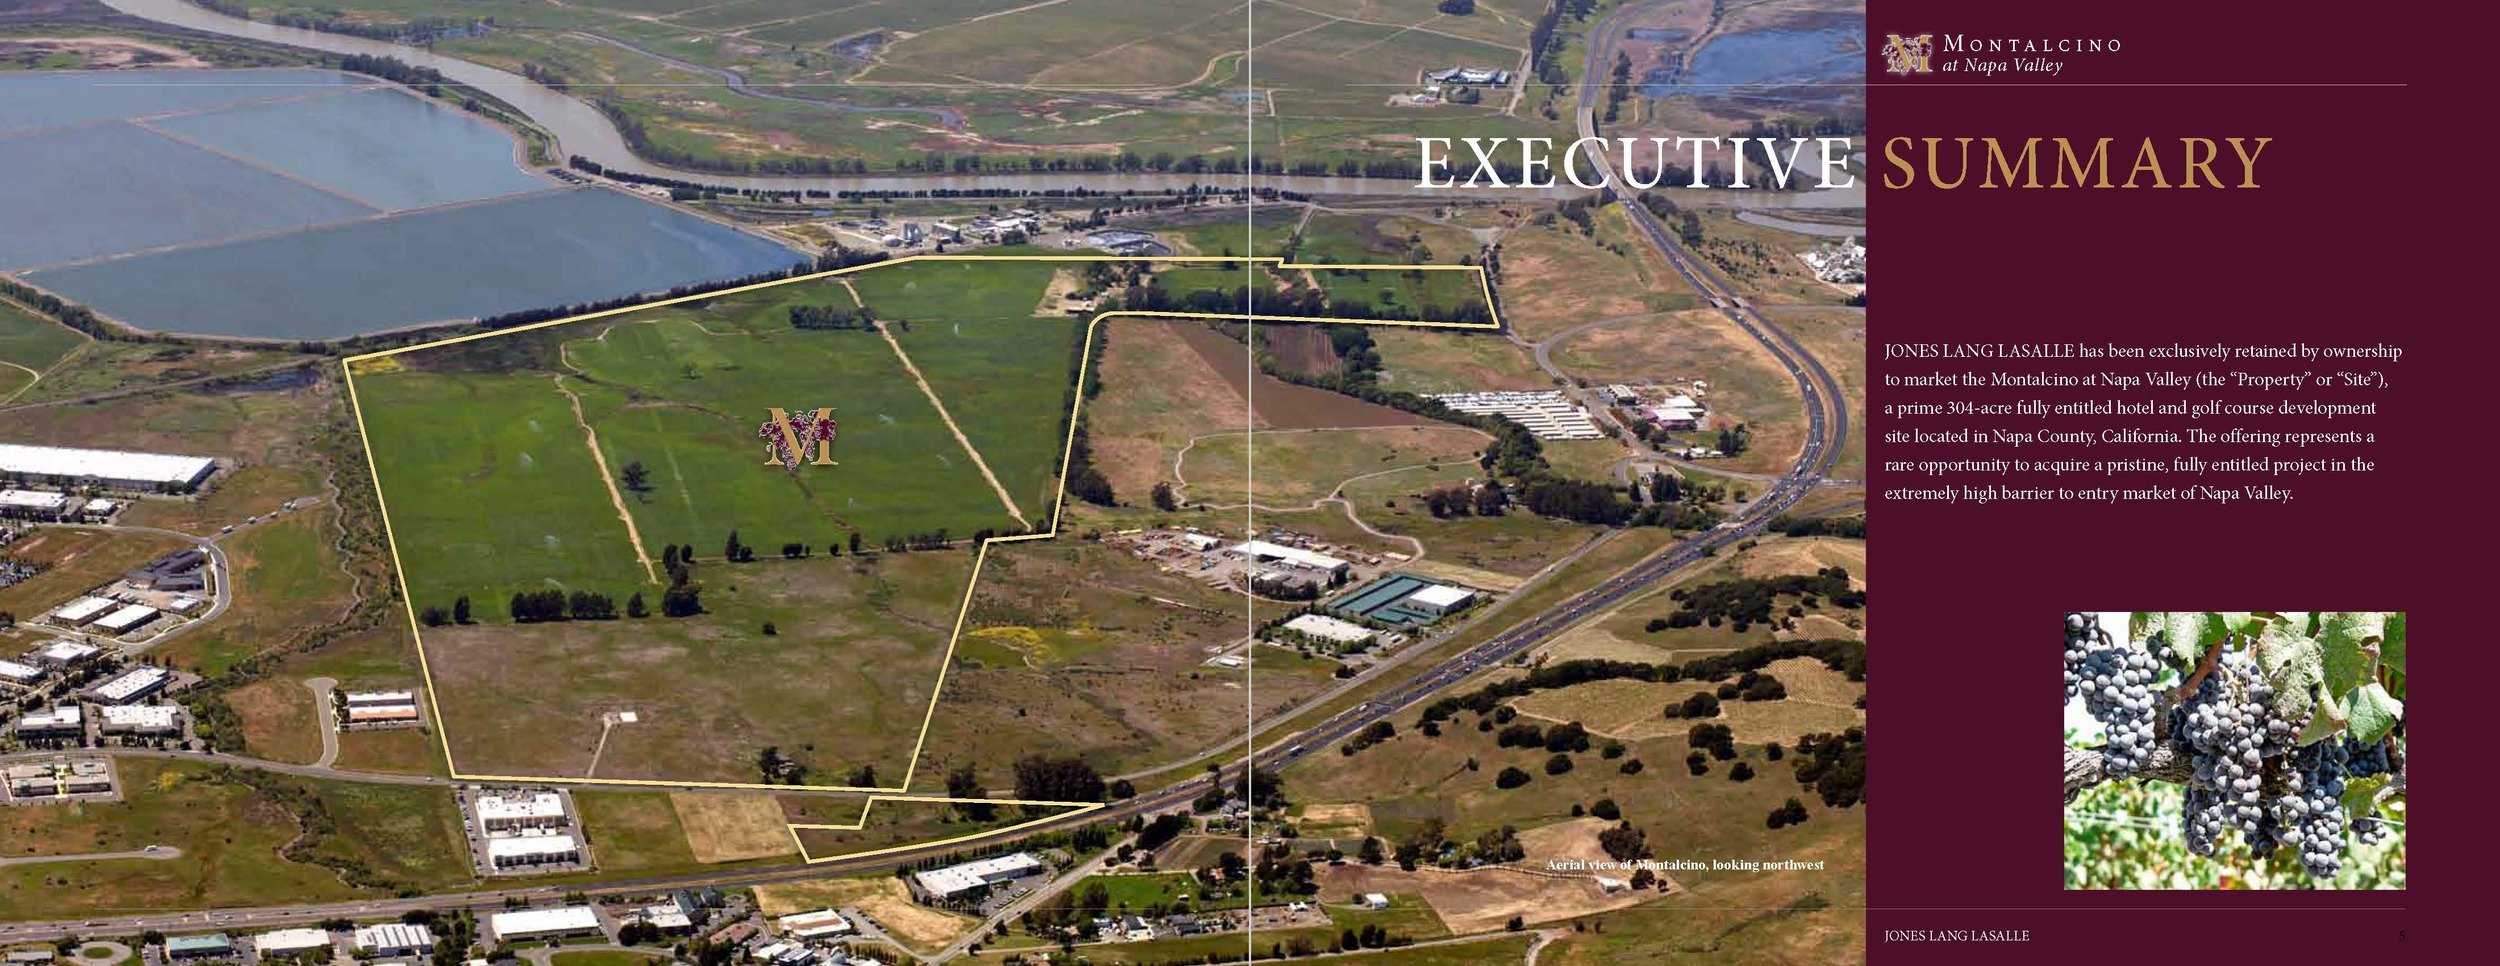 Napa Valley resort property offering from Jones Lang LaSalle.